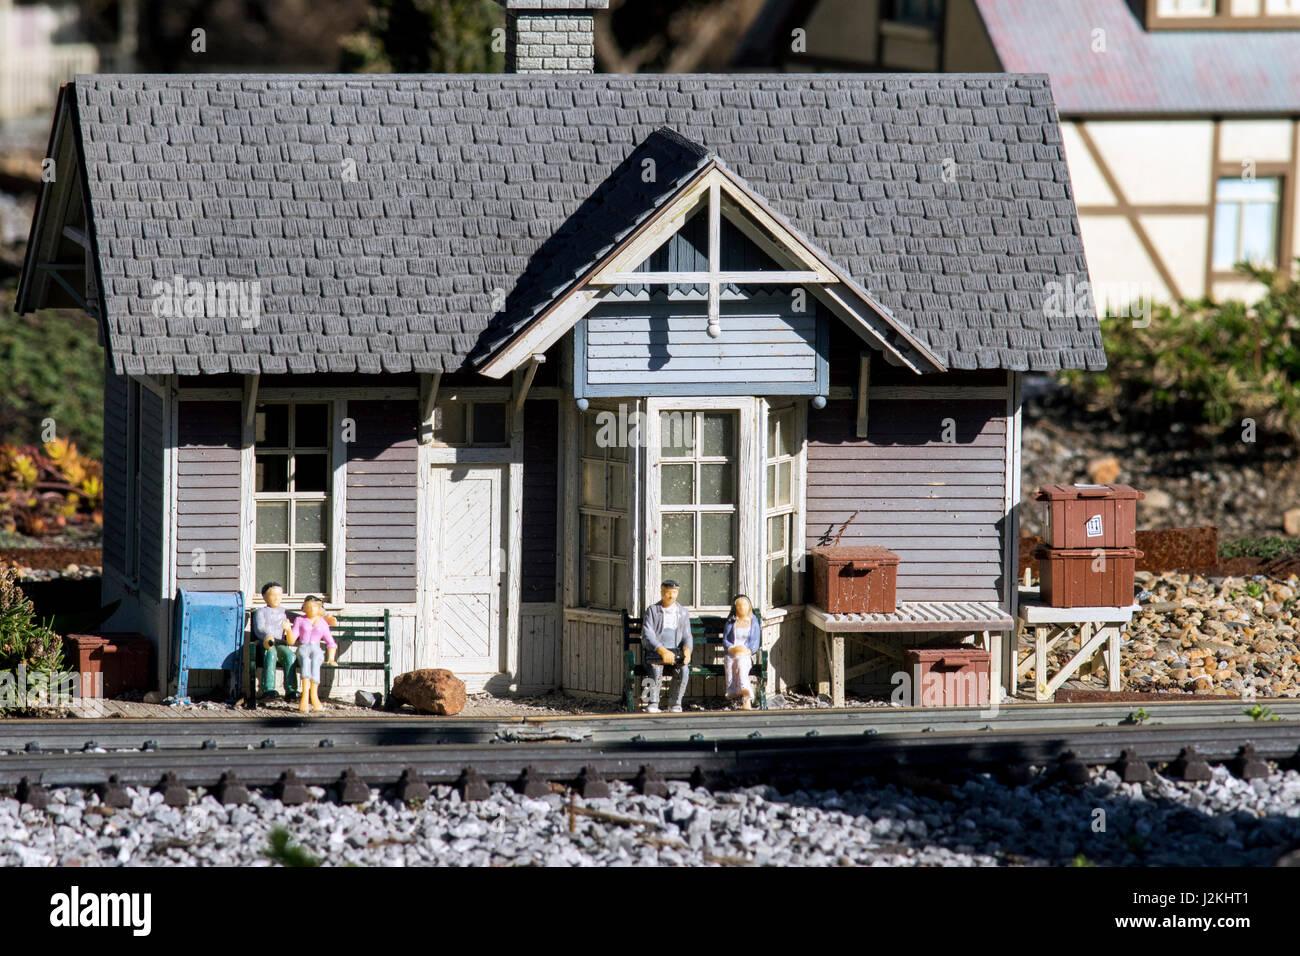 Rocky Cove Railroad Exhibit  - North Carolina Arboretum, Asheville, North Carolina, USA - Stock Image